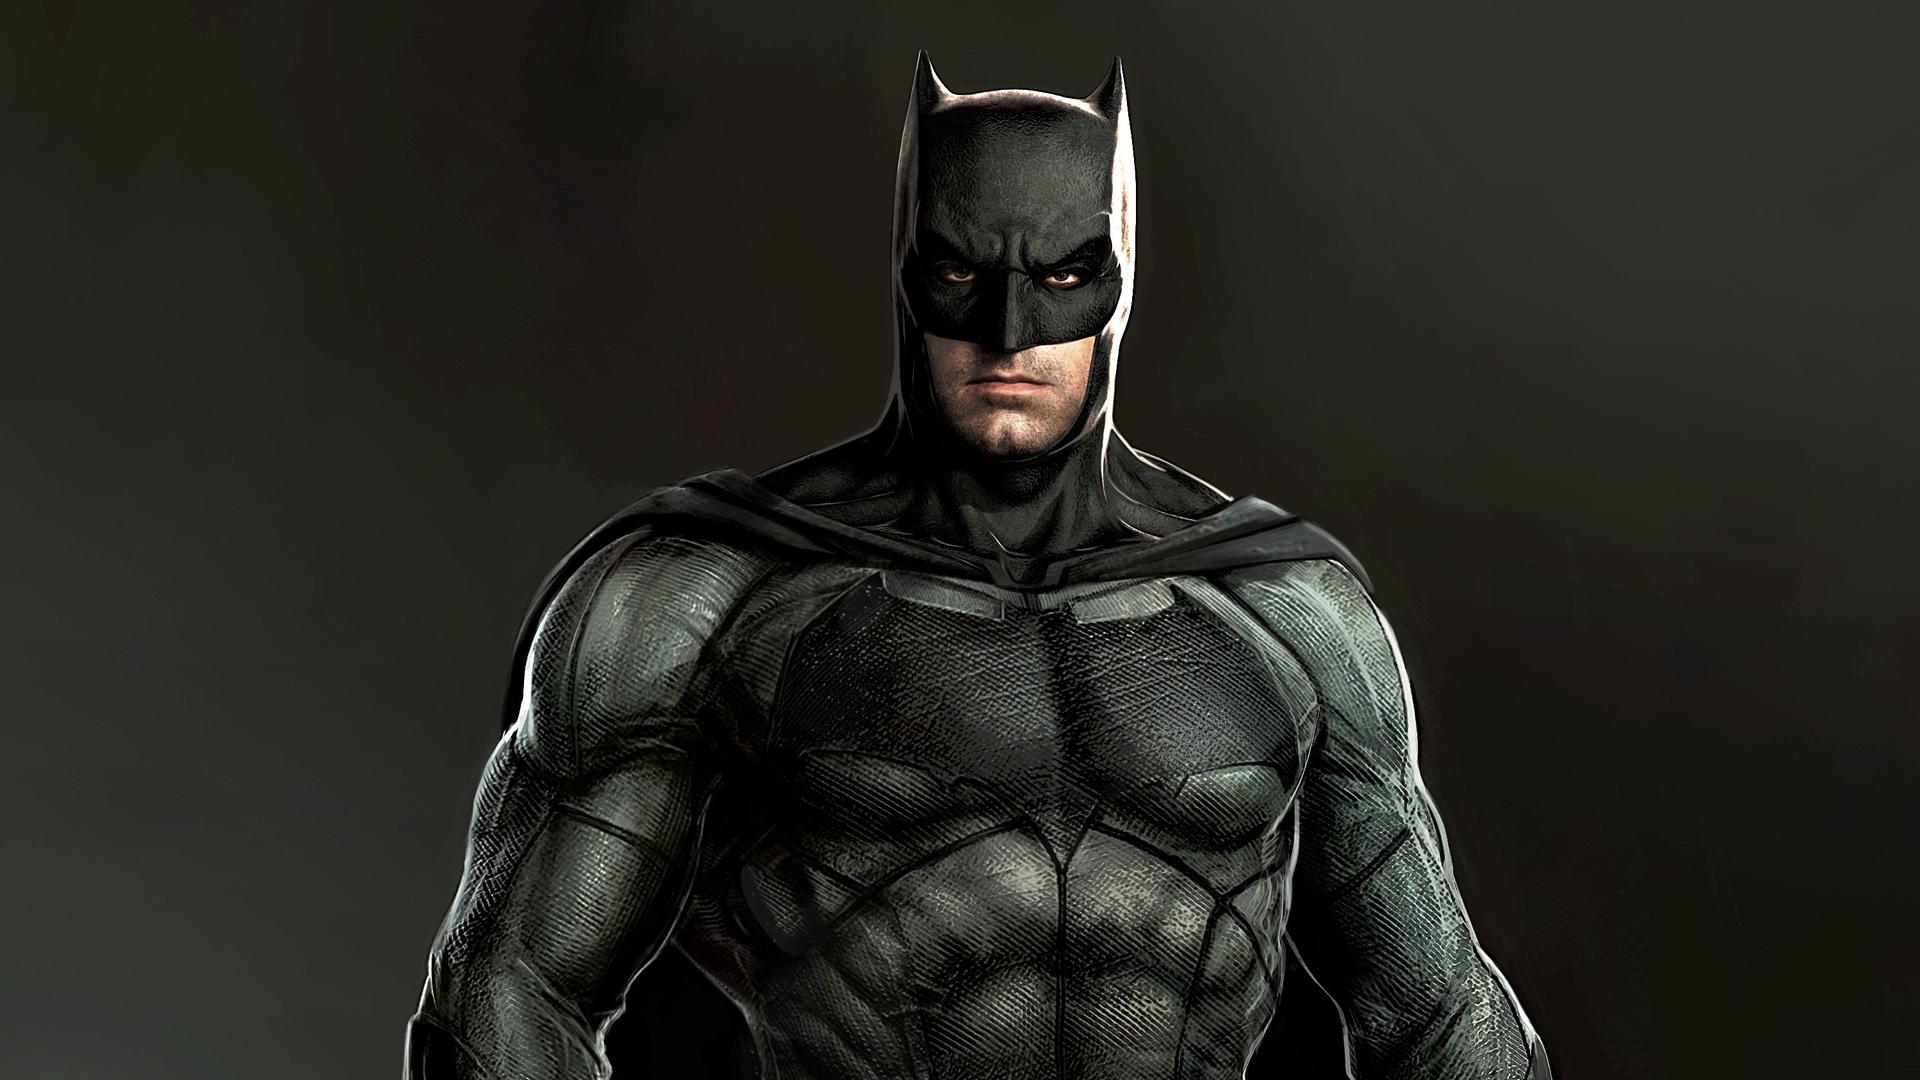 1920x1080 Batman Conceptartwork Laptop Full HD 1080P HD 4k ...